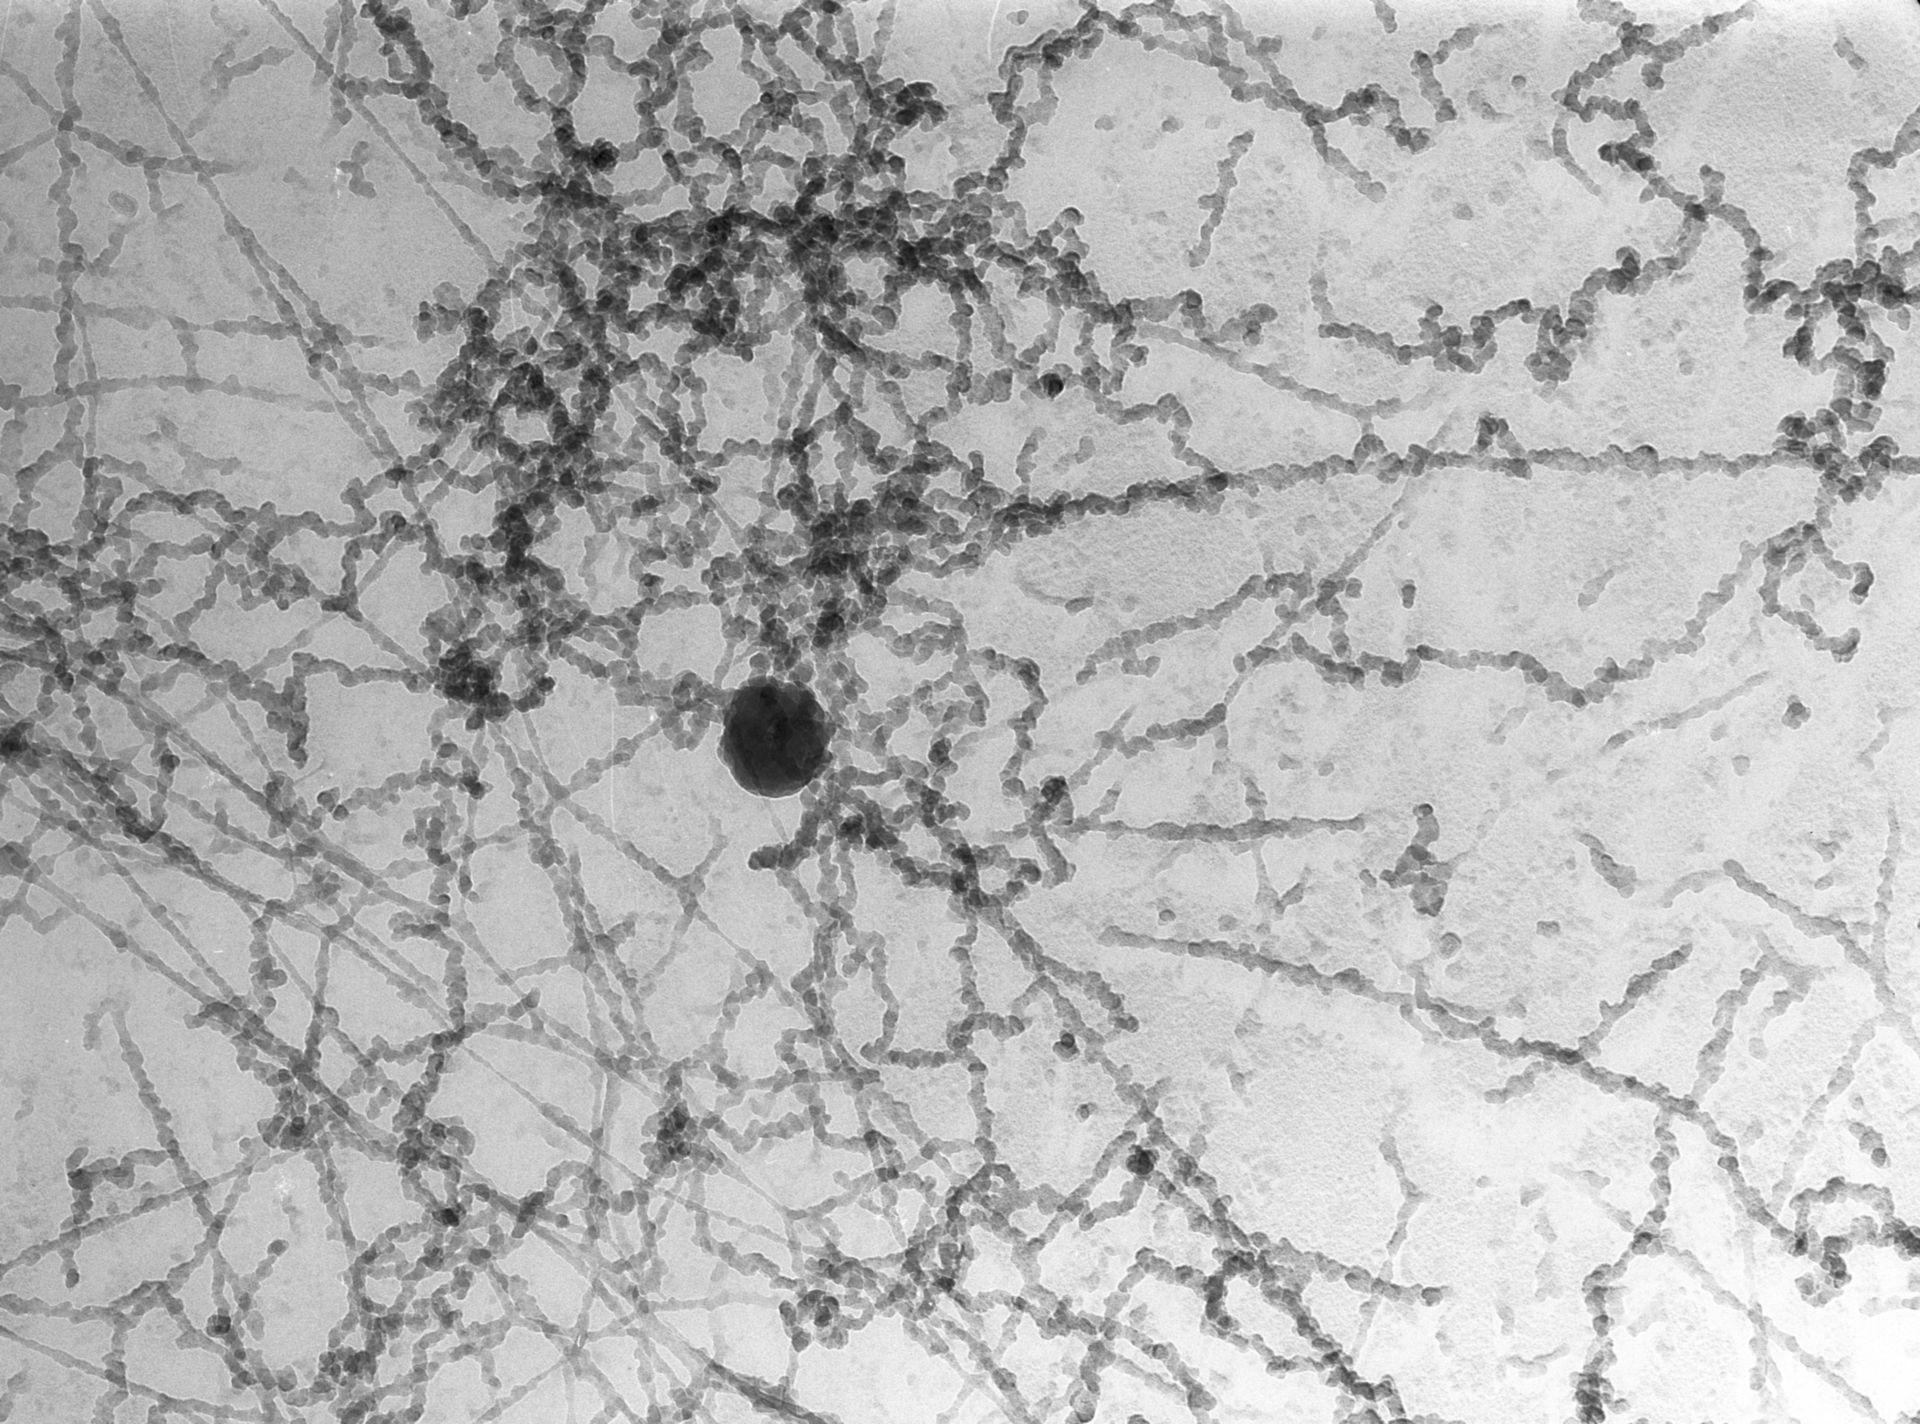 Notopthalmus viridescence (Nuclear chromatin) - CIL:10090